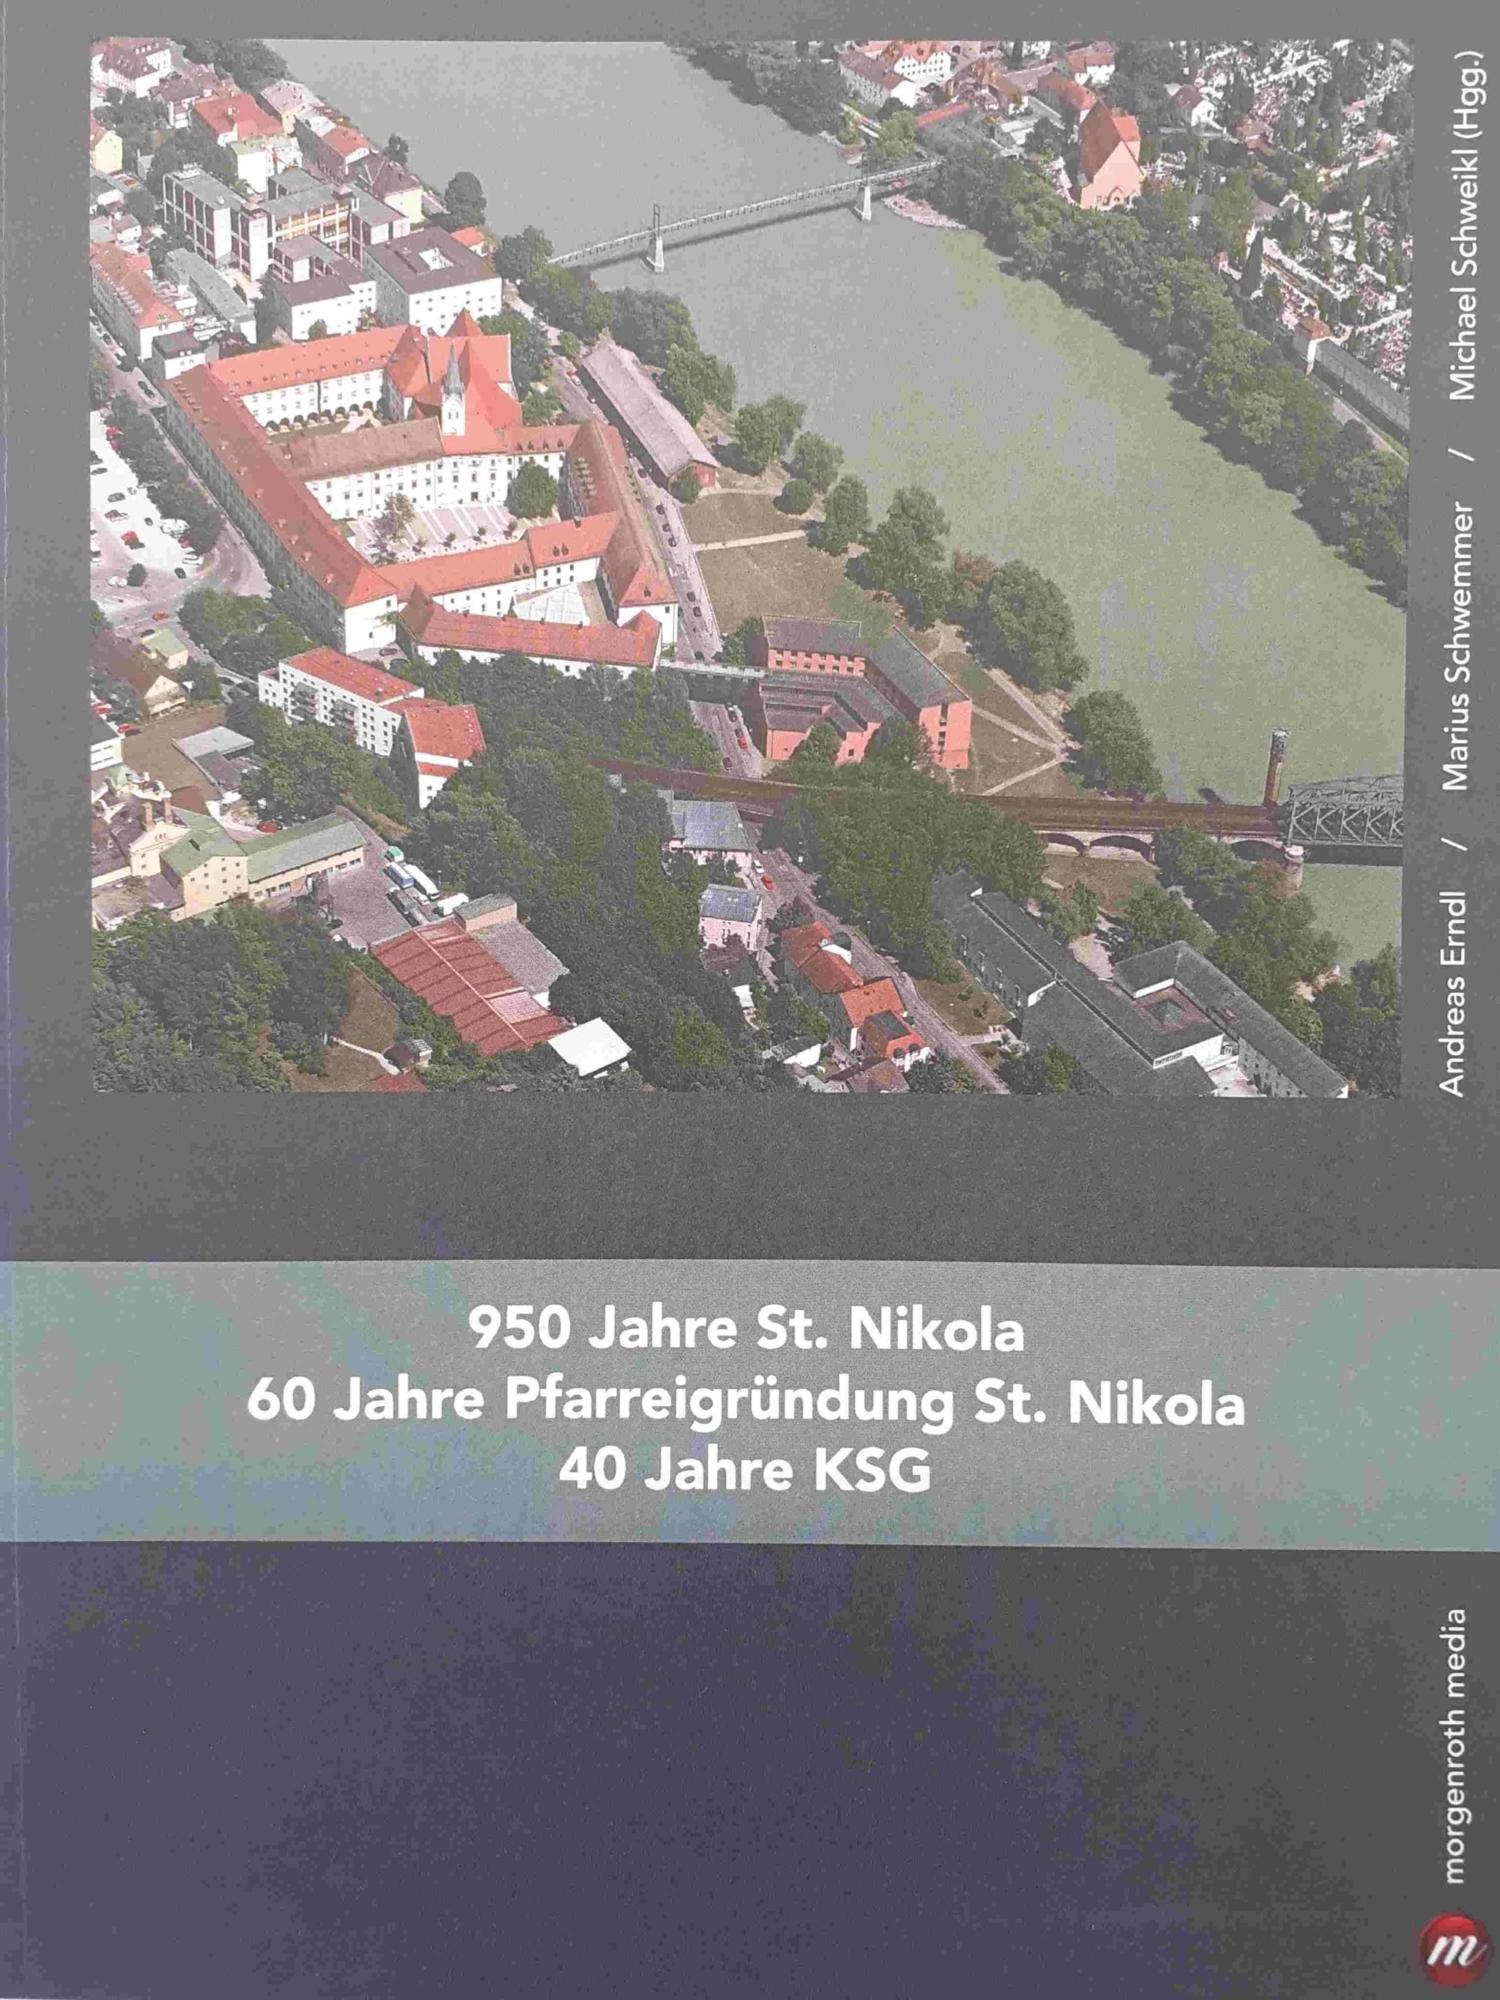 2021 Bild 950 Jahre St Nikola web